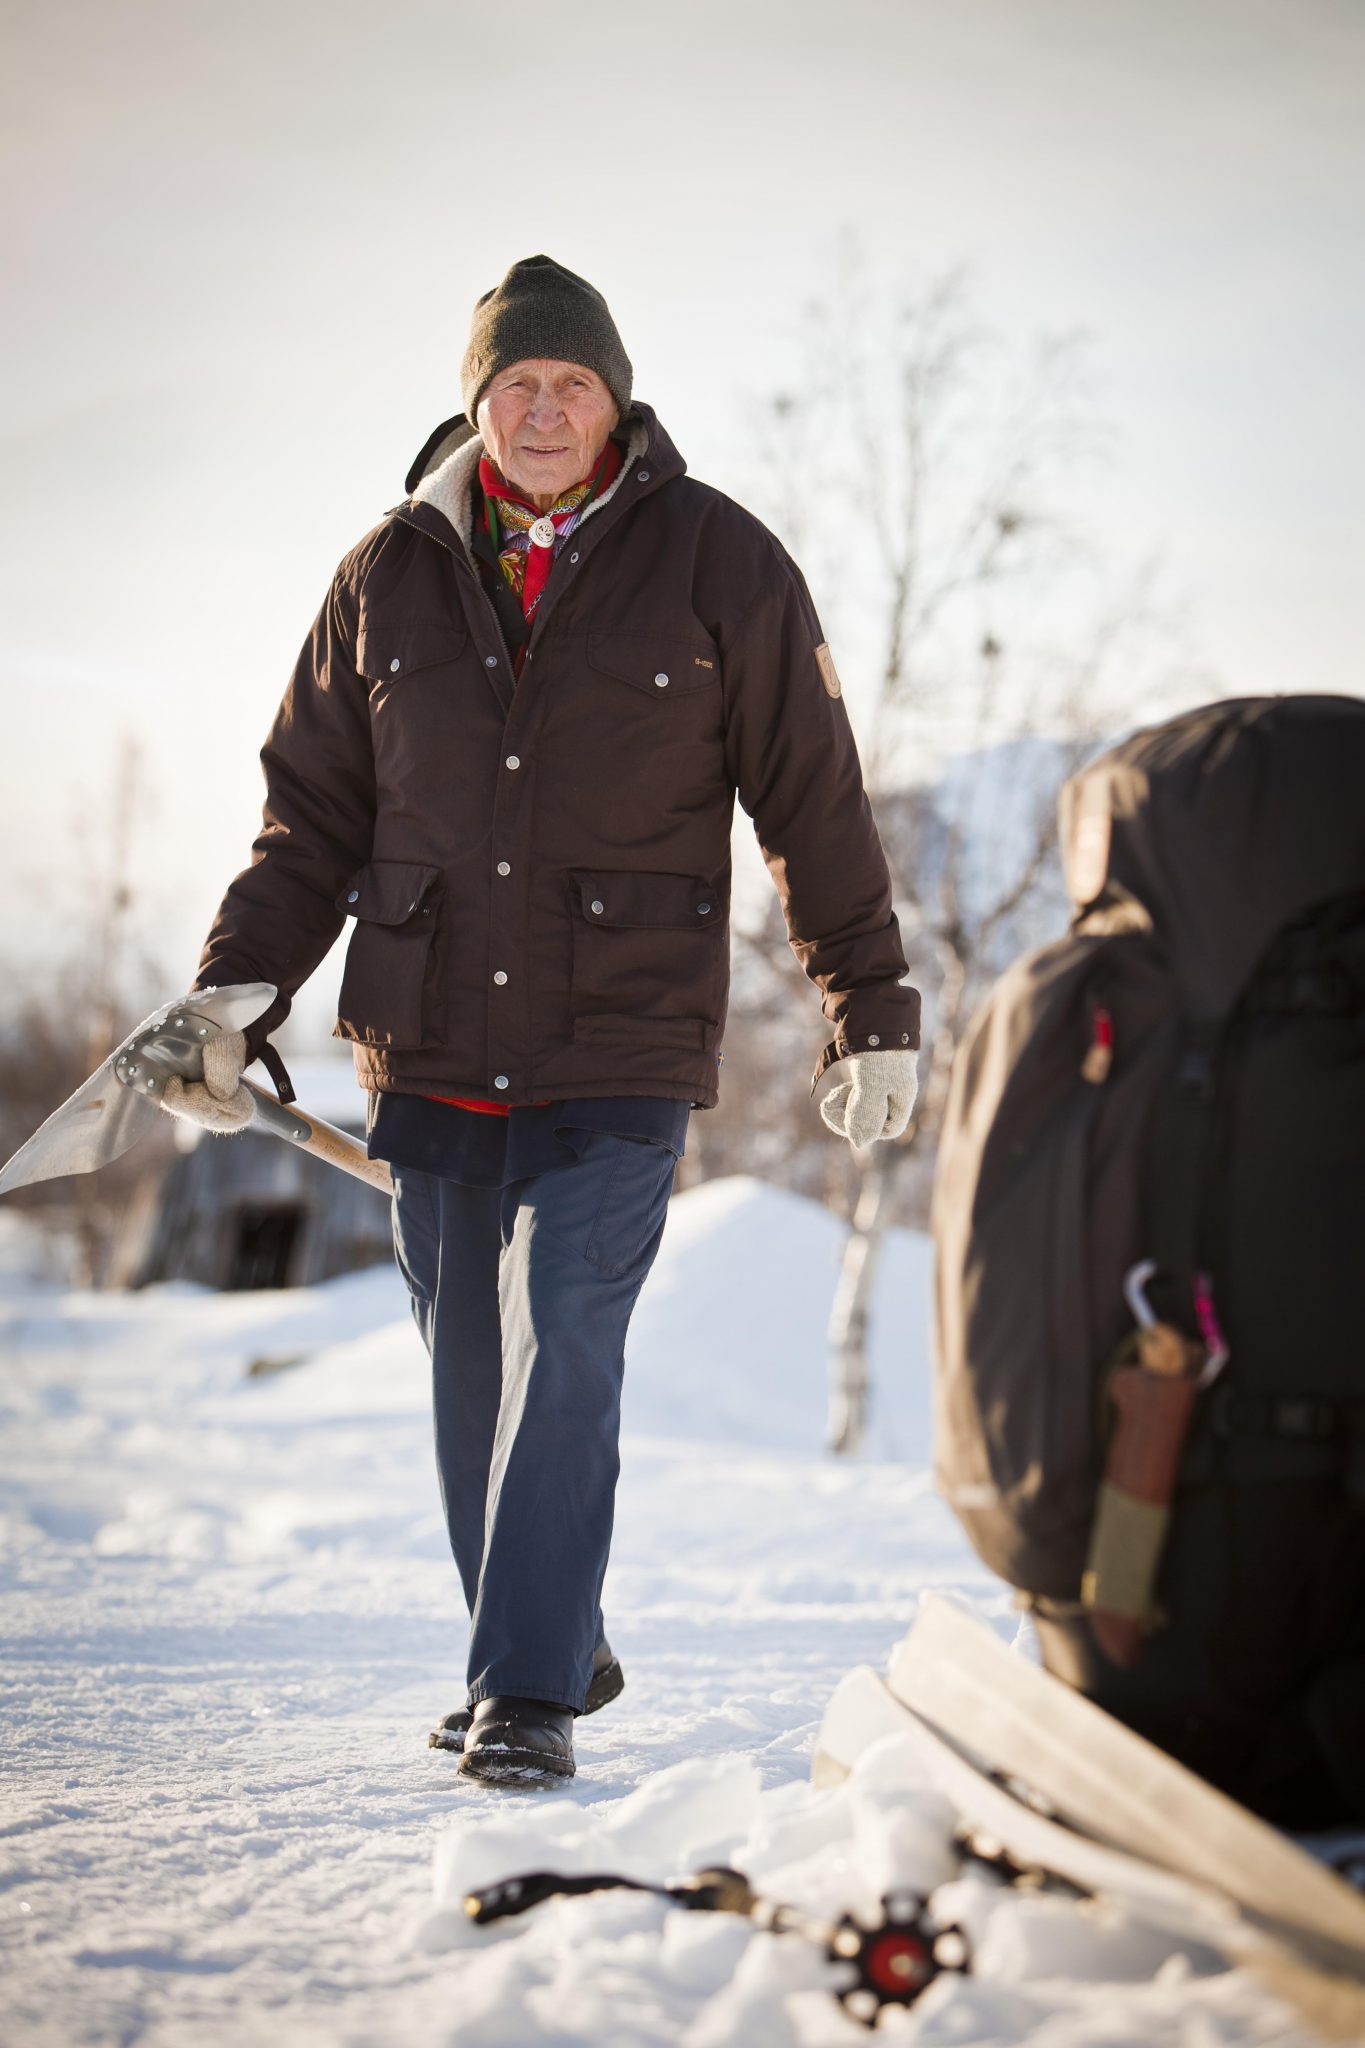 Fjallraven Greenland Winter Jacket Night Sky Camp Kitchen